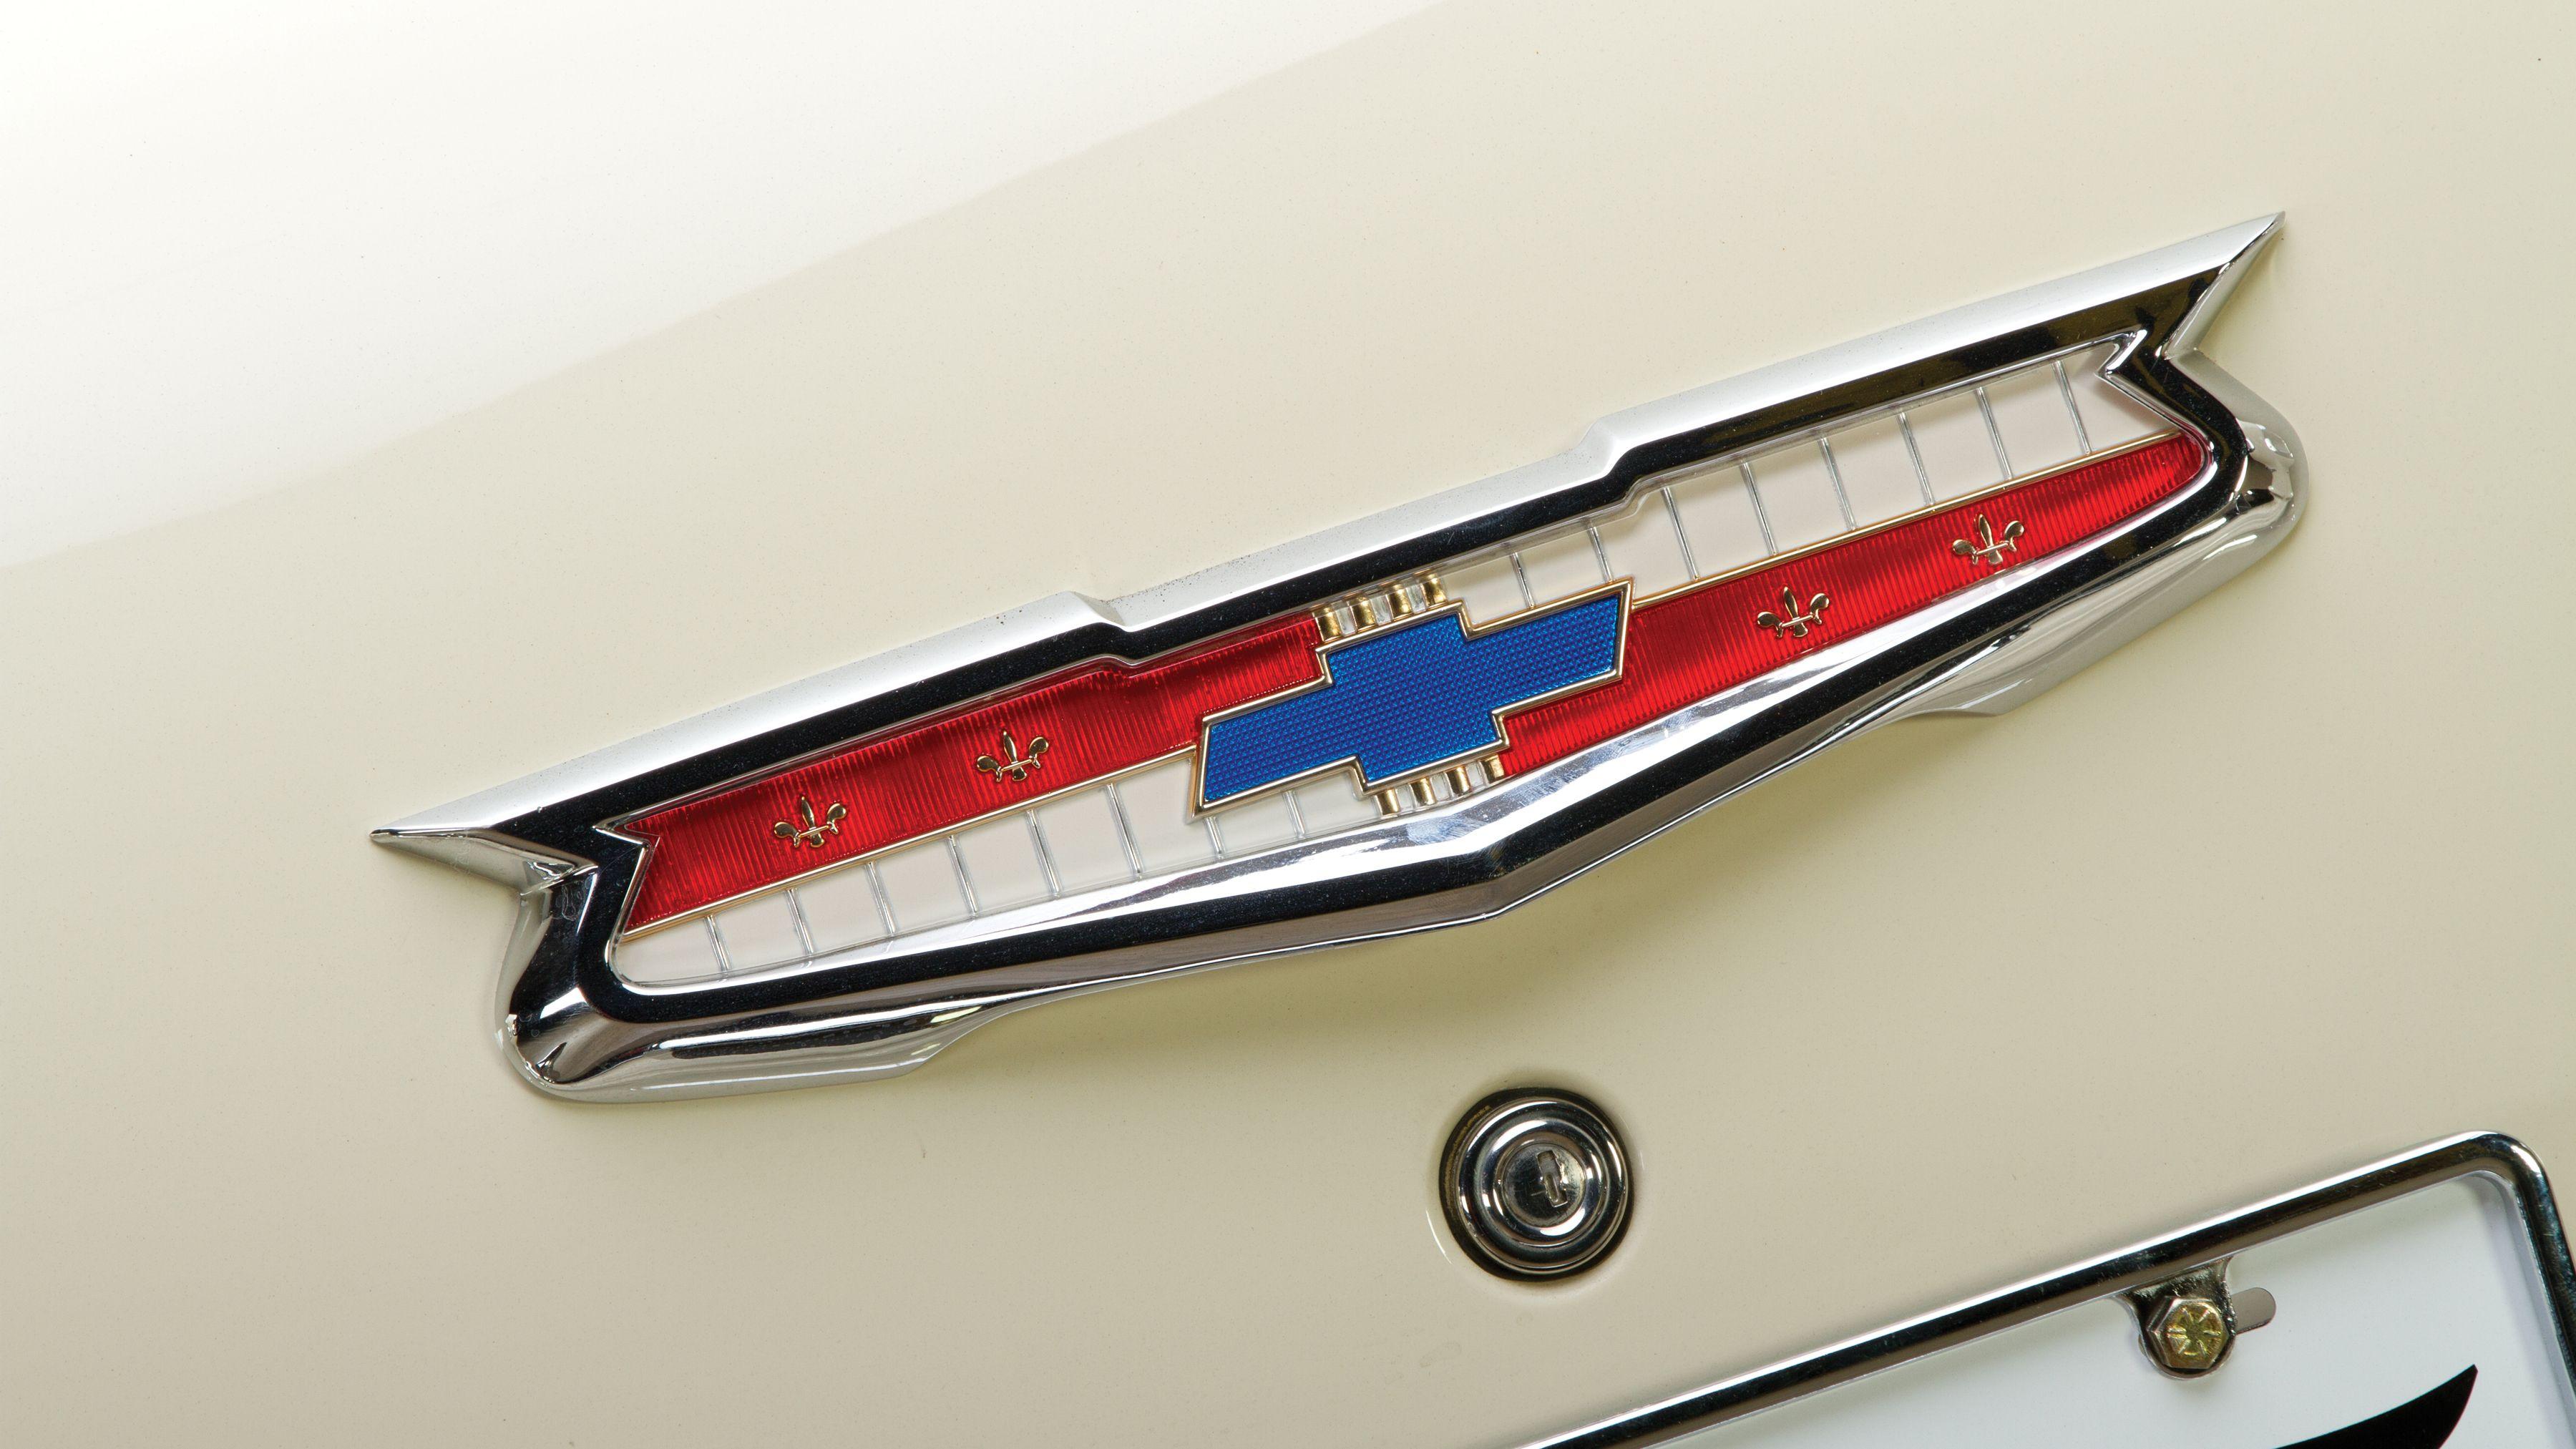 Chevrolet Bel Air Convertible 1955